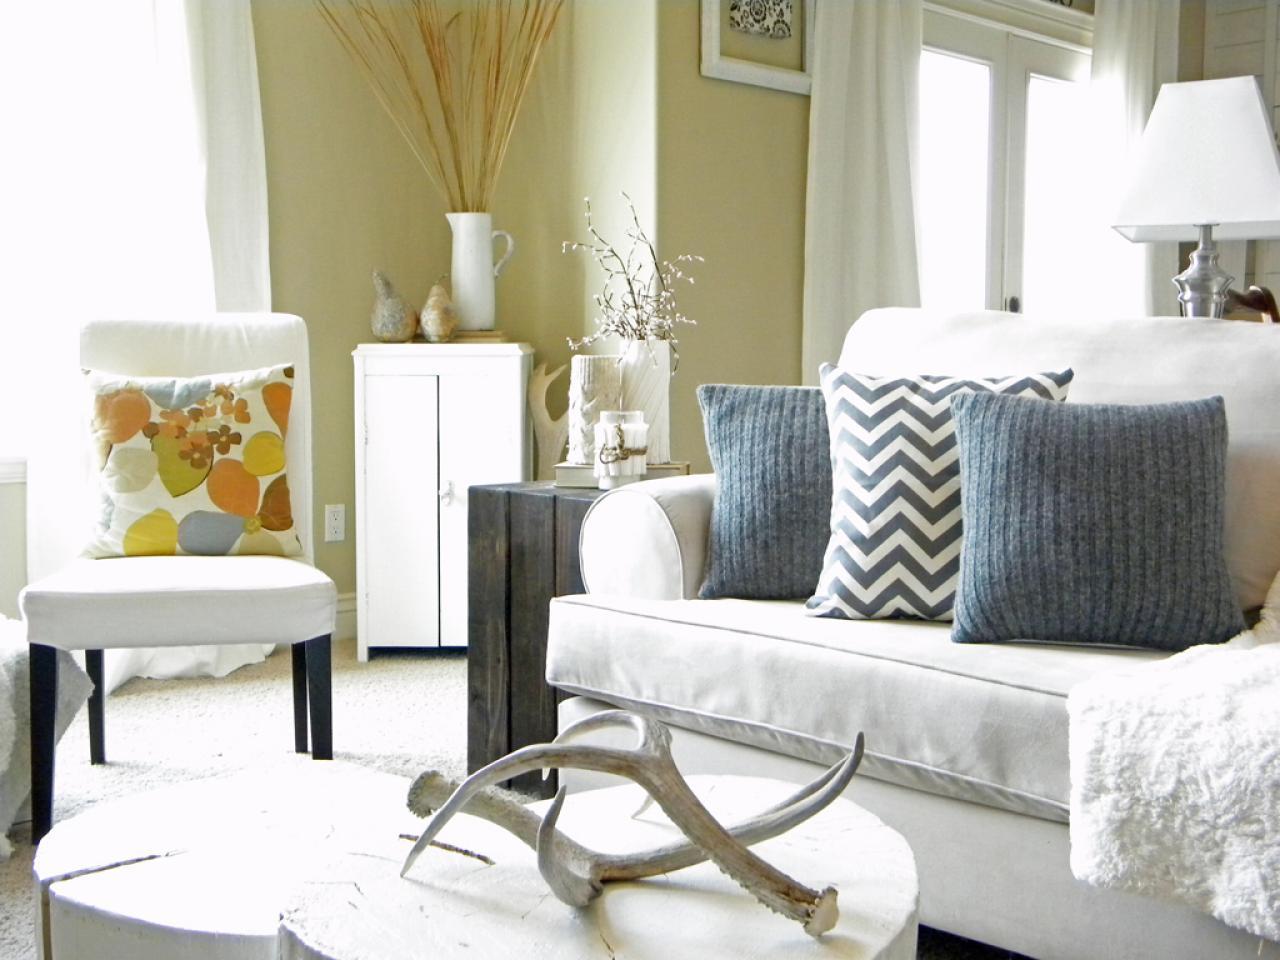 5 DIY Ideas for Creating a Cozy Home   HGTV\'s Decorating & Design ...